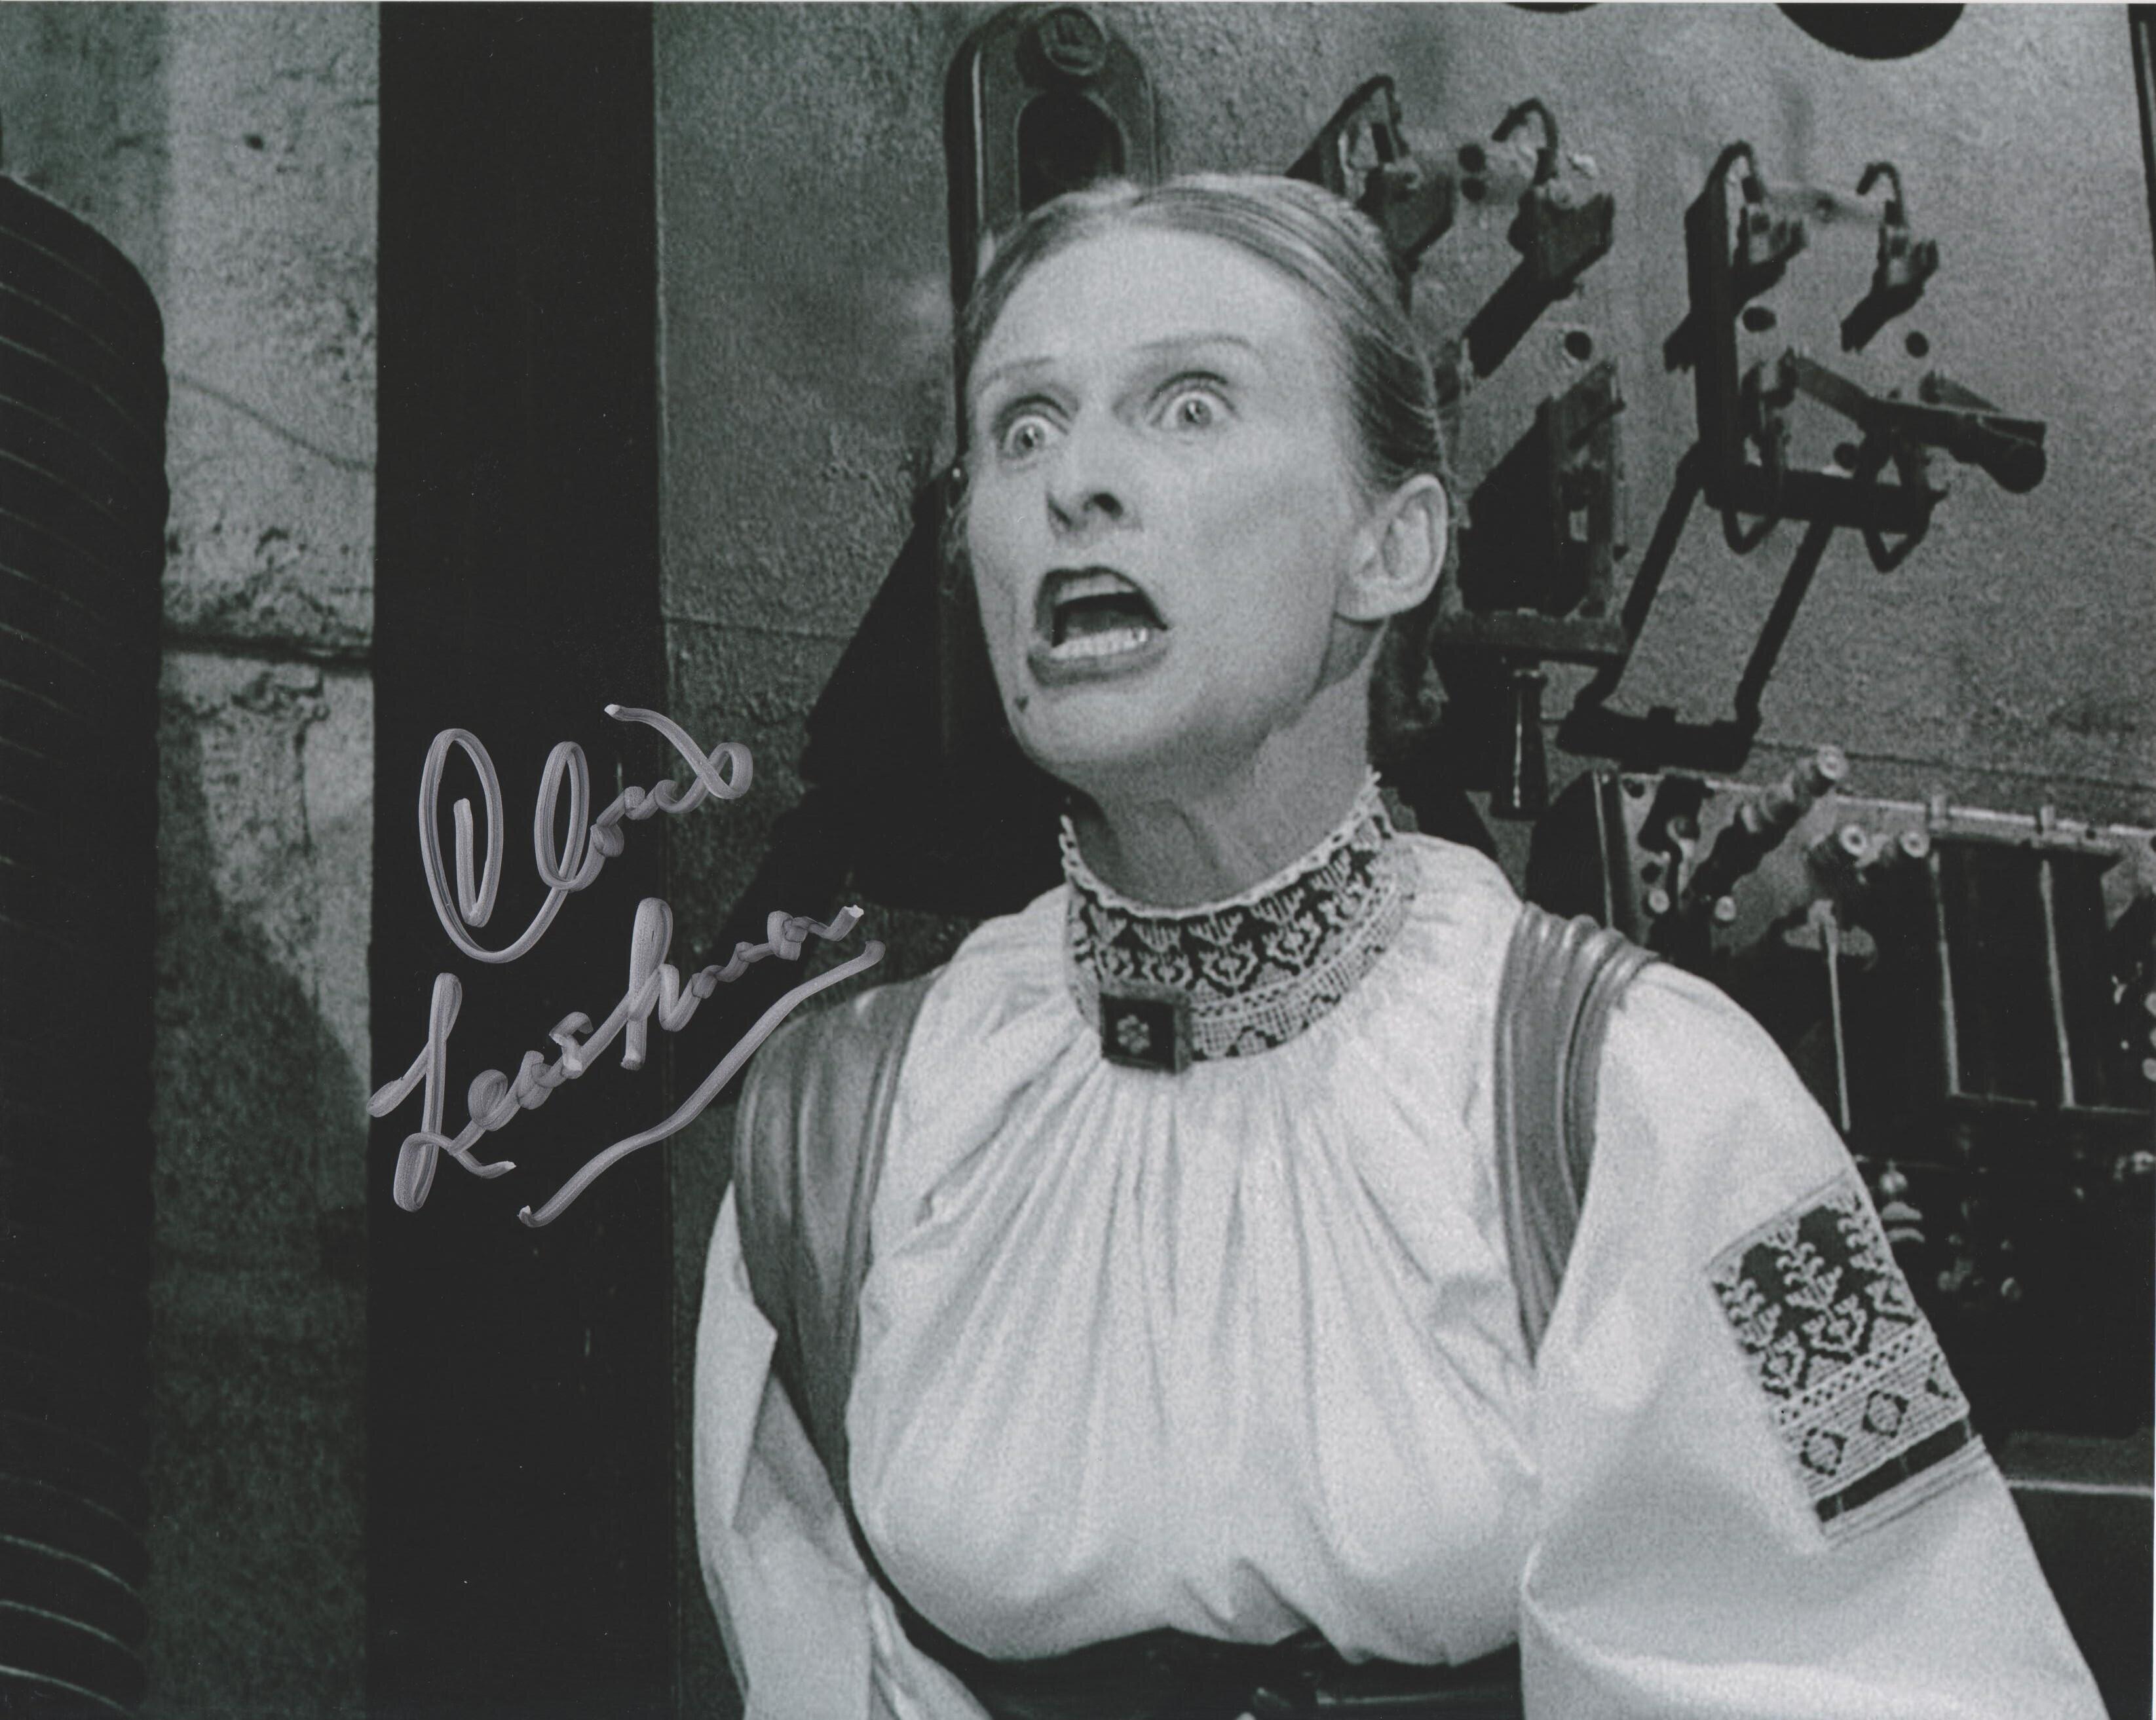 Cloris Leachman Young Frankenstein #3